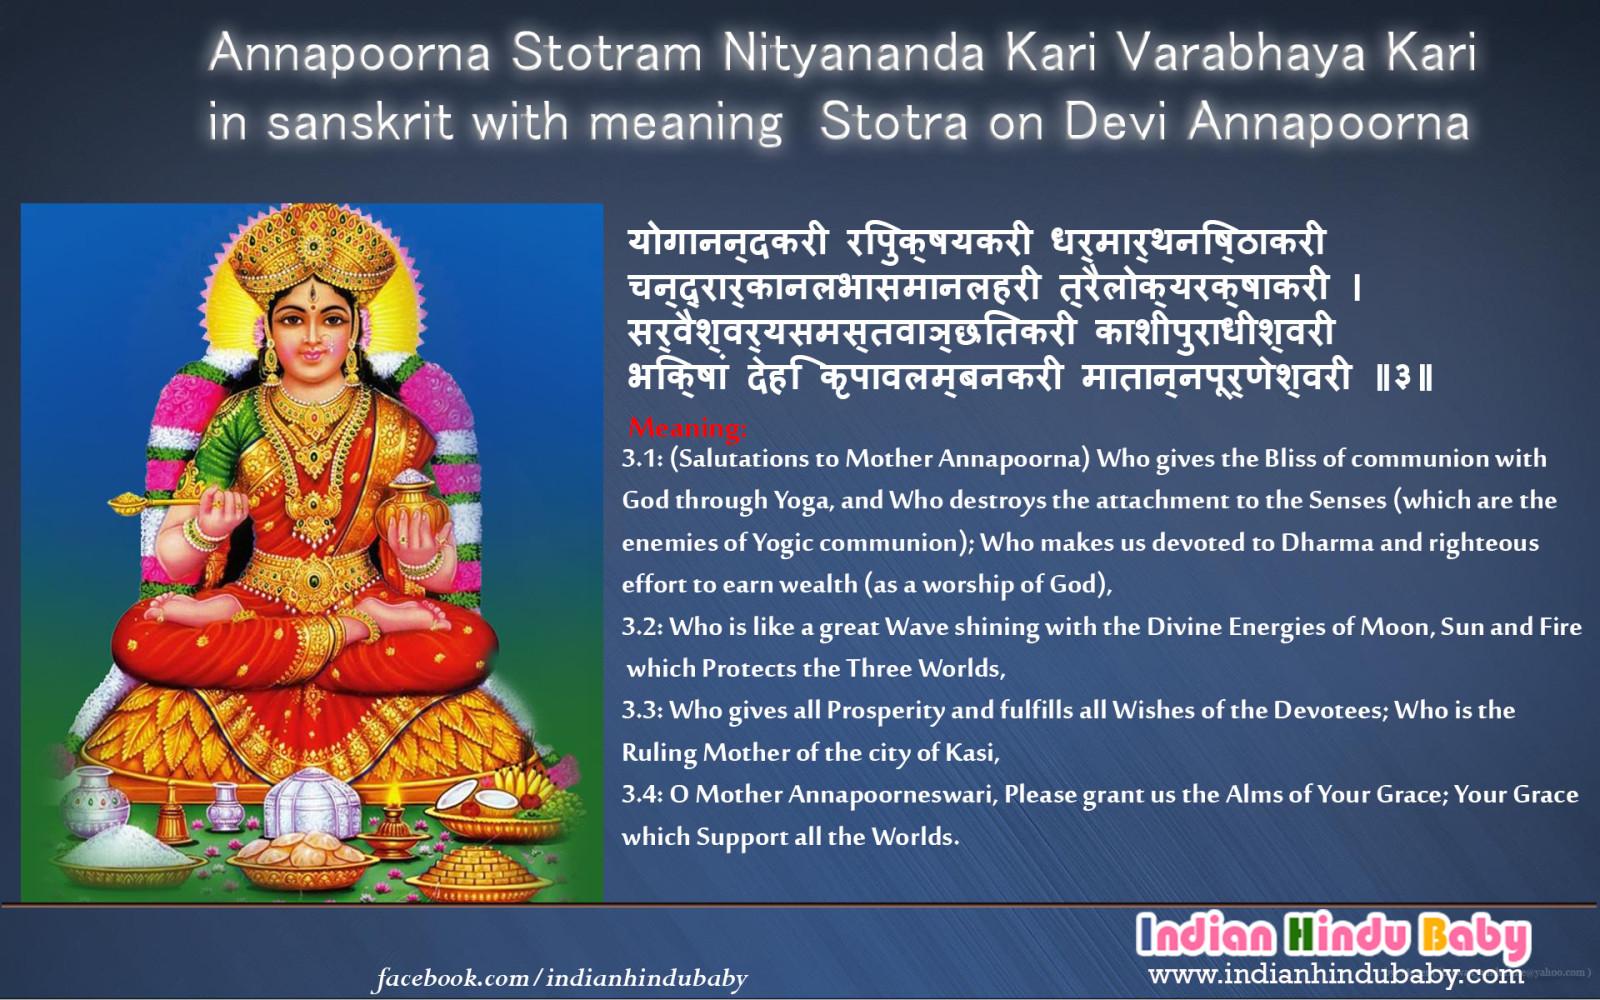 Annapoorna Stotram Nityananda Kari Varabhaya Kari in sanskrit with meaning Stotra on Devi Annapoorna-3